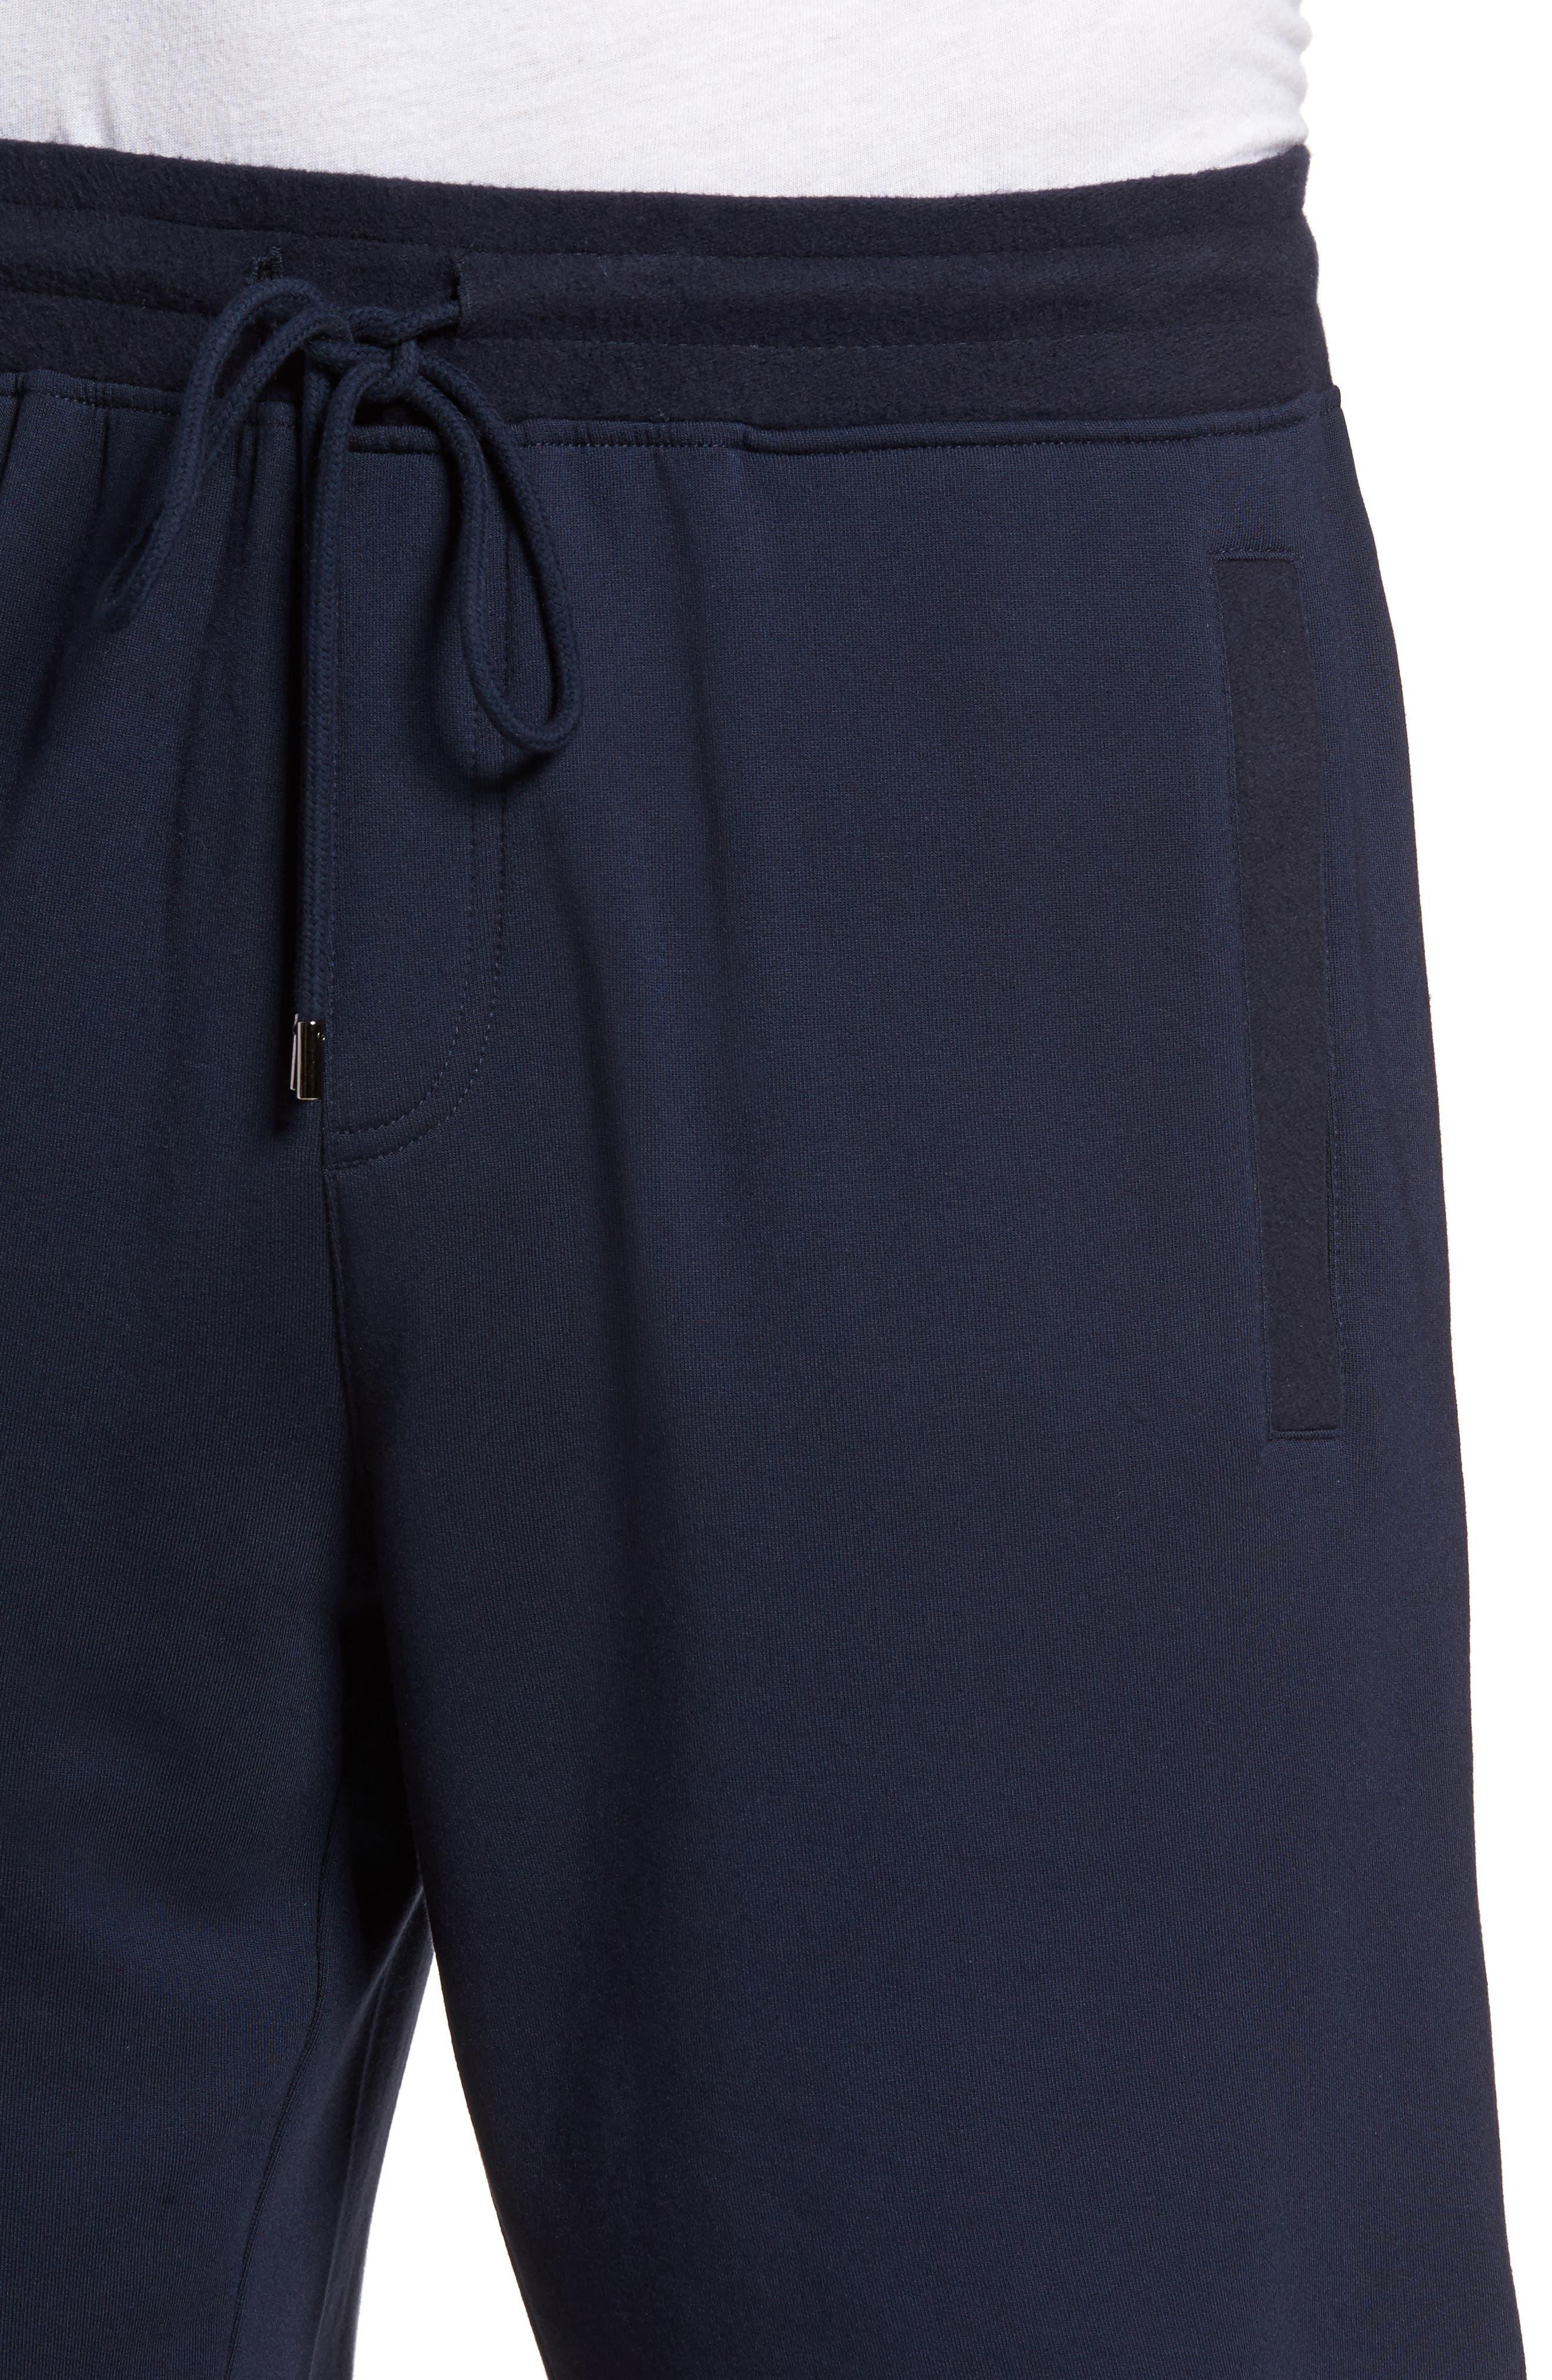 Modal Blend Lounge Shorts,                             Alternate thumbnail 4, color,                             411